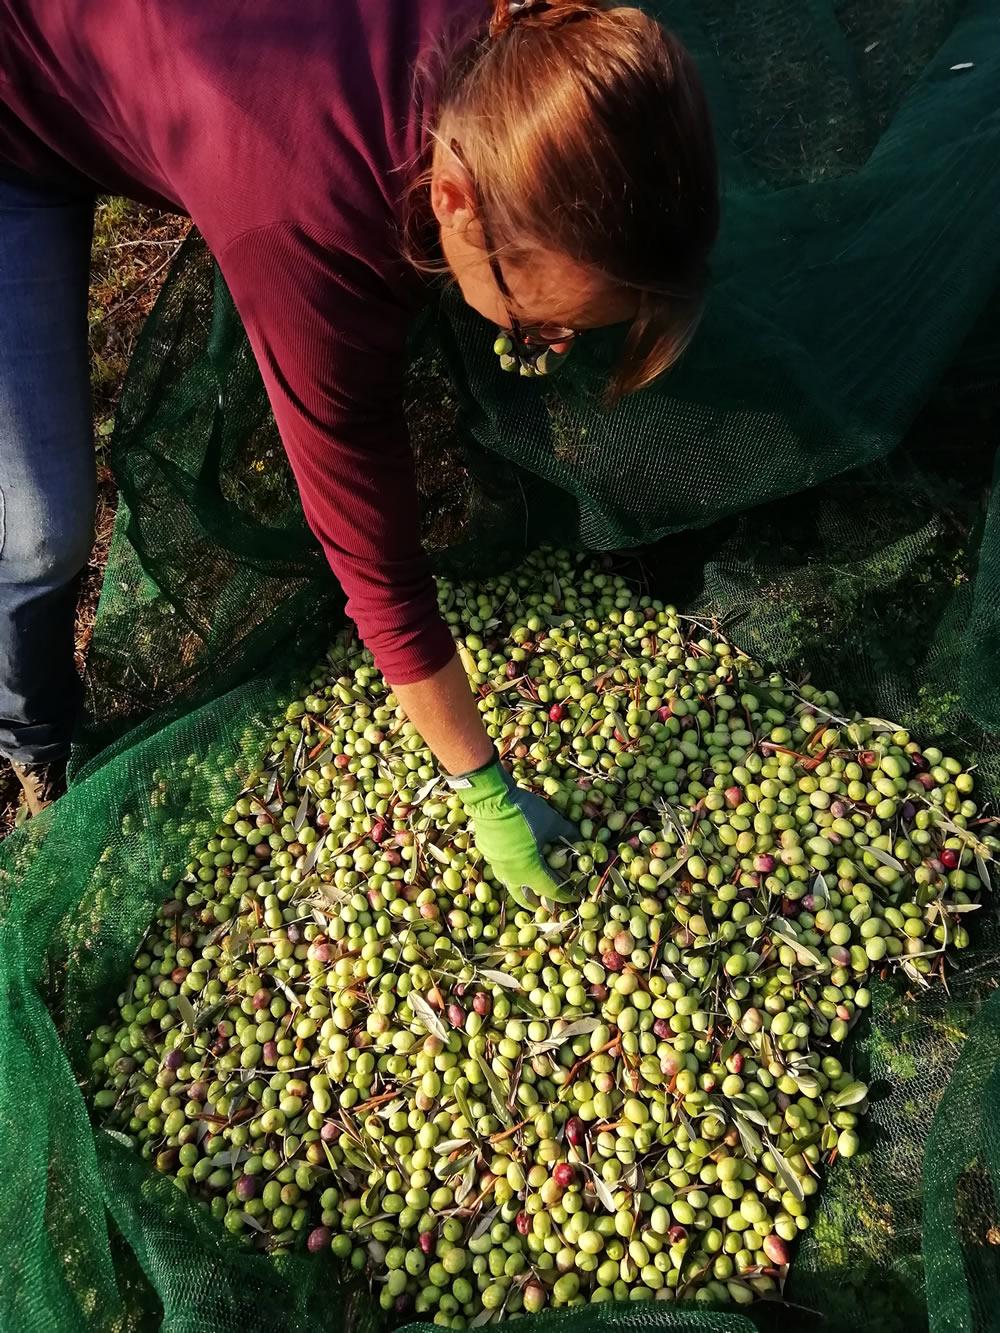 Raccolta olive in agriturismo e produzione olio - Pergola ...